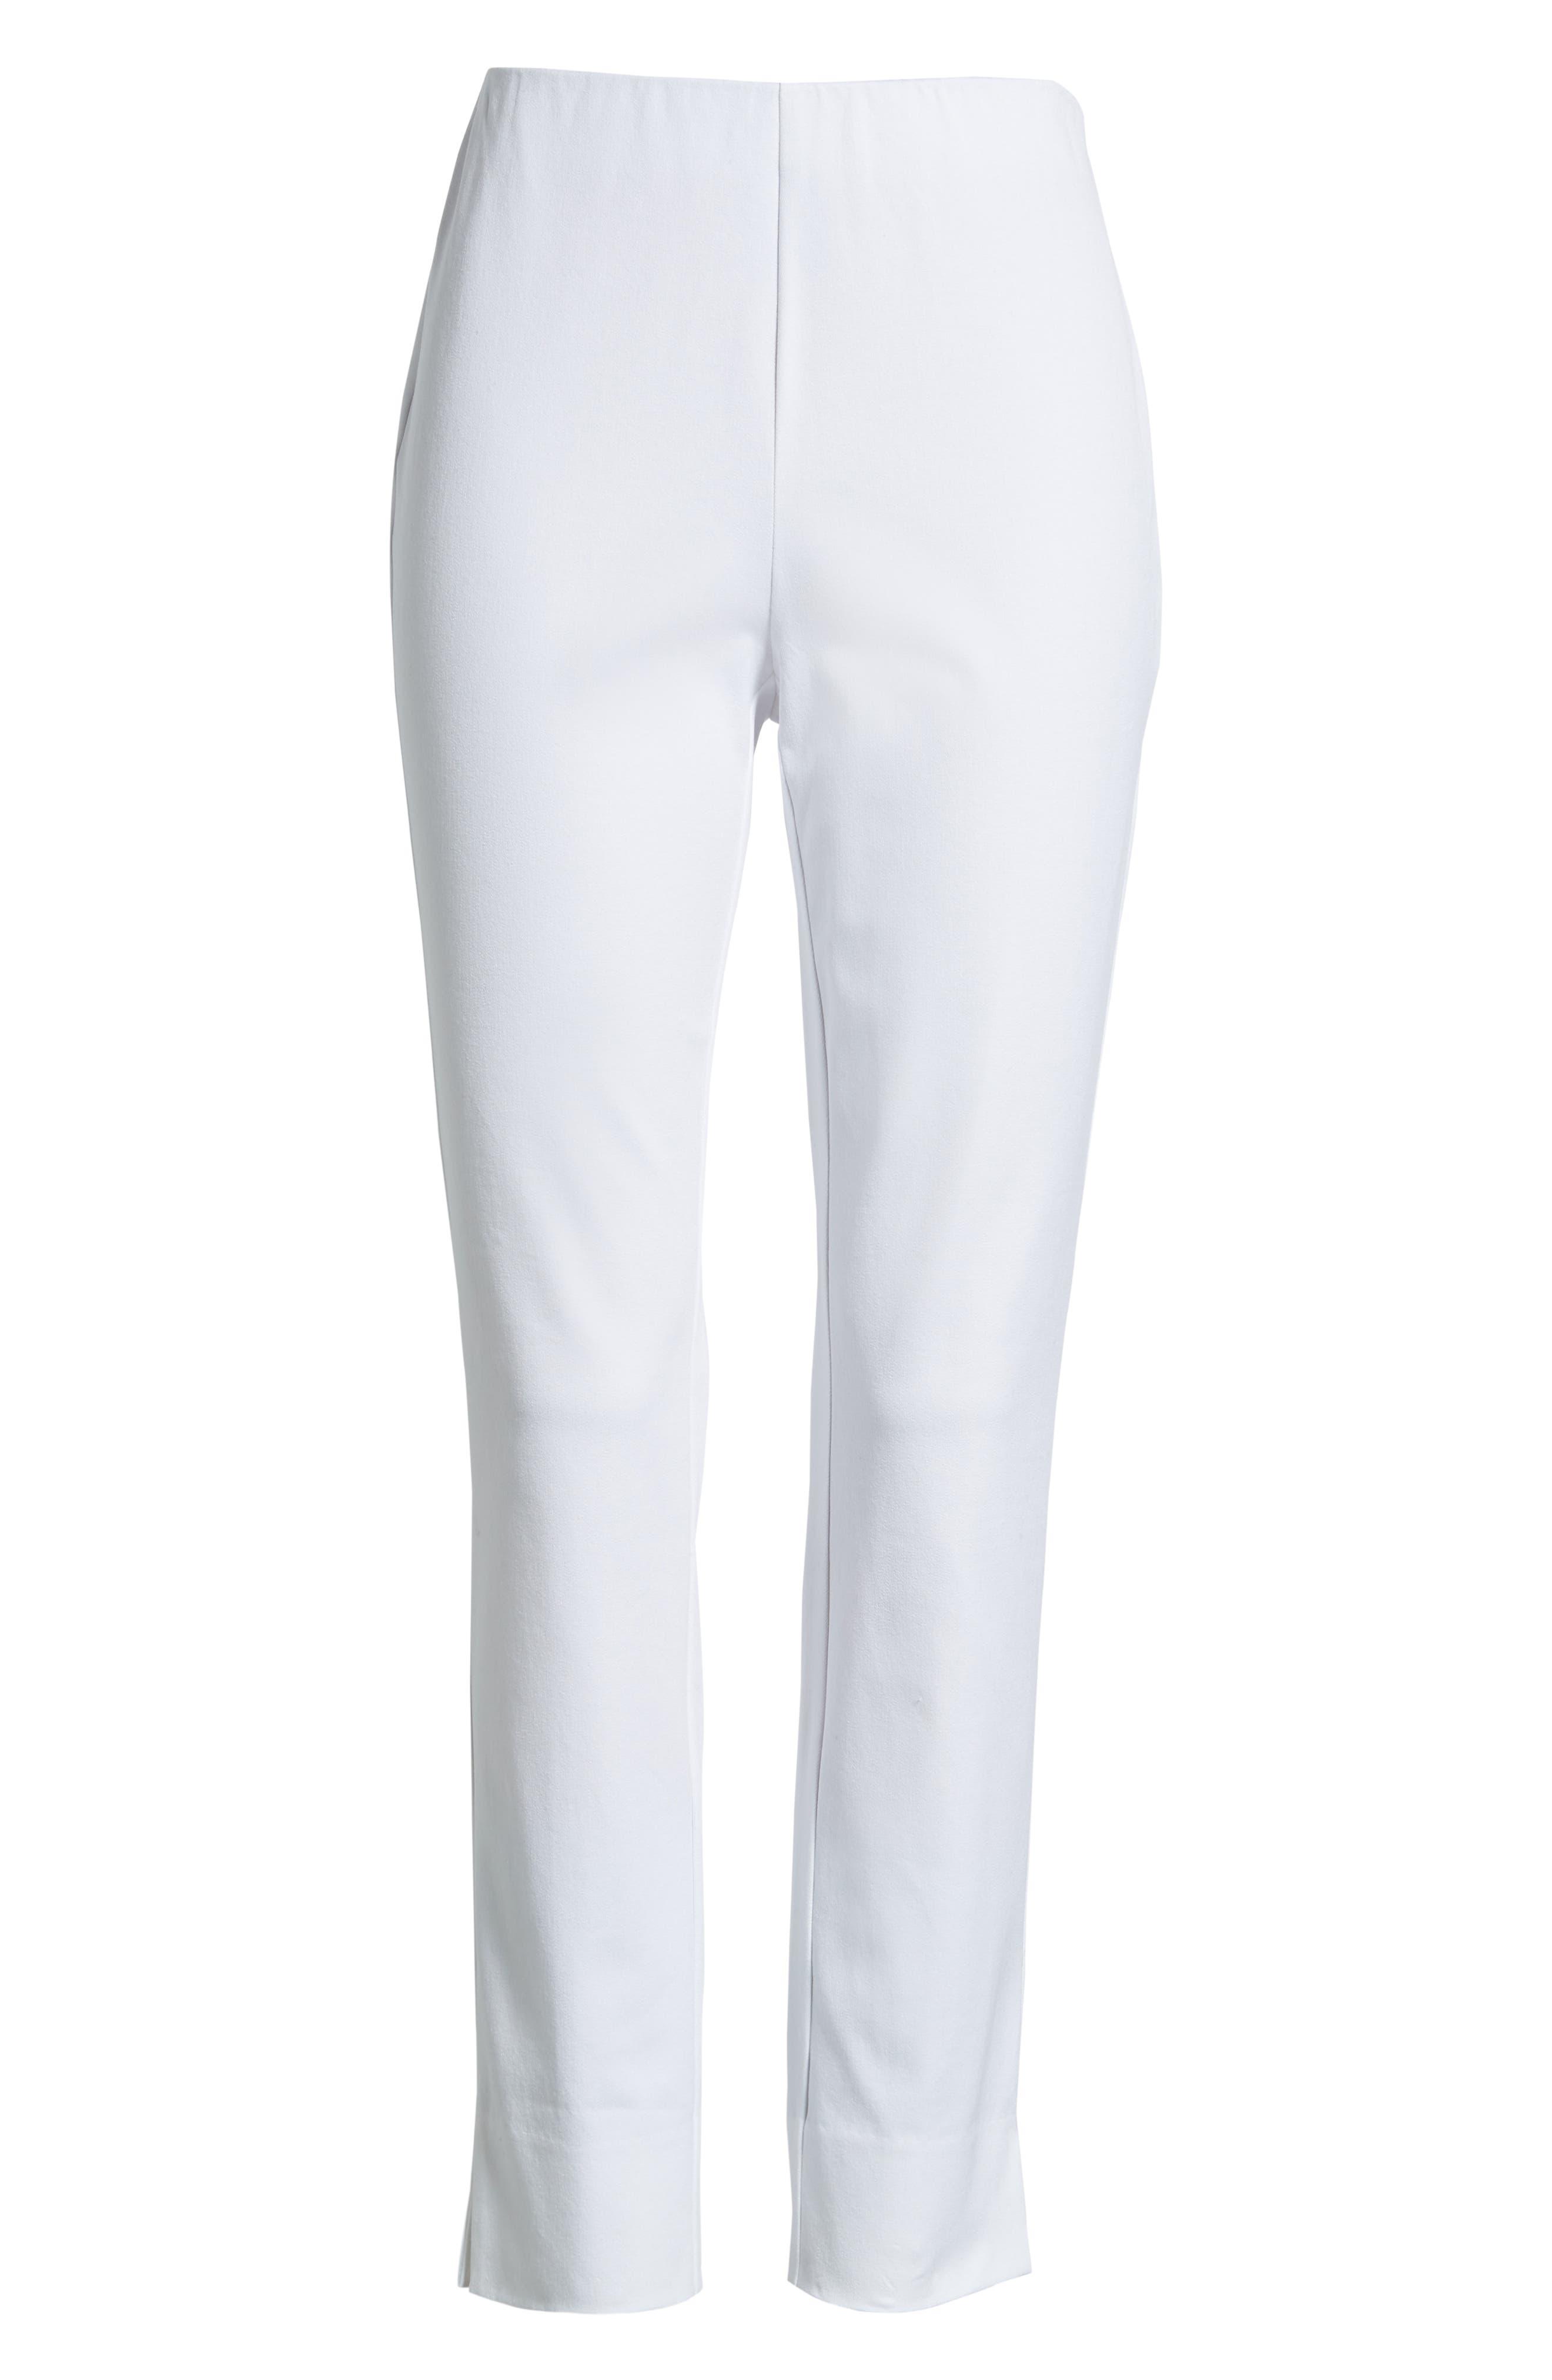 Skinny Stretch Pants,                             Alternate thumbnail 7, color,                             WHITE